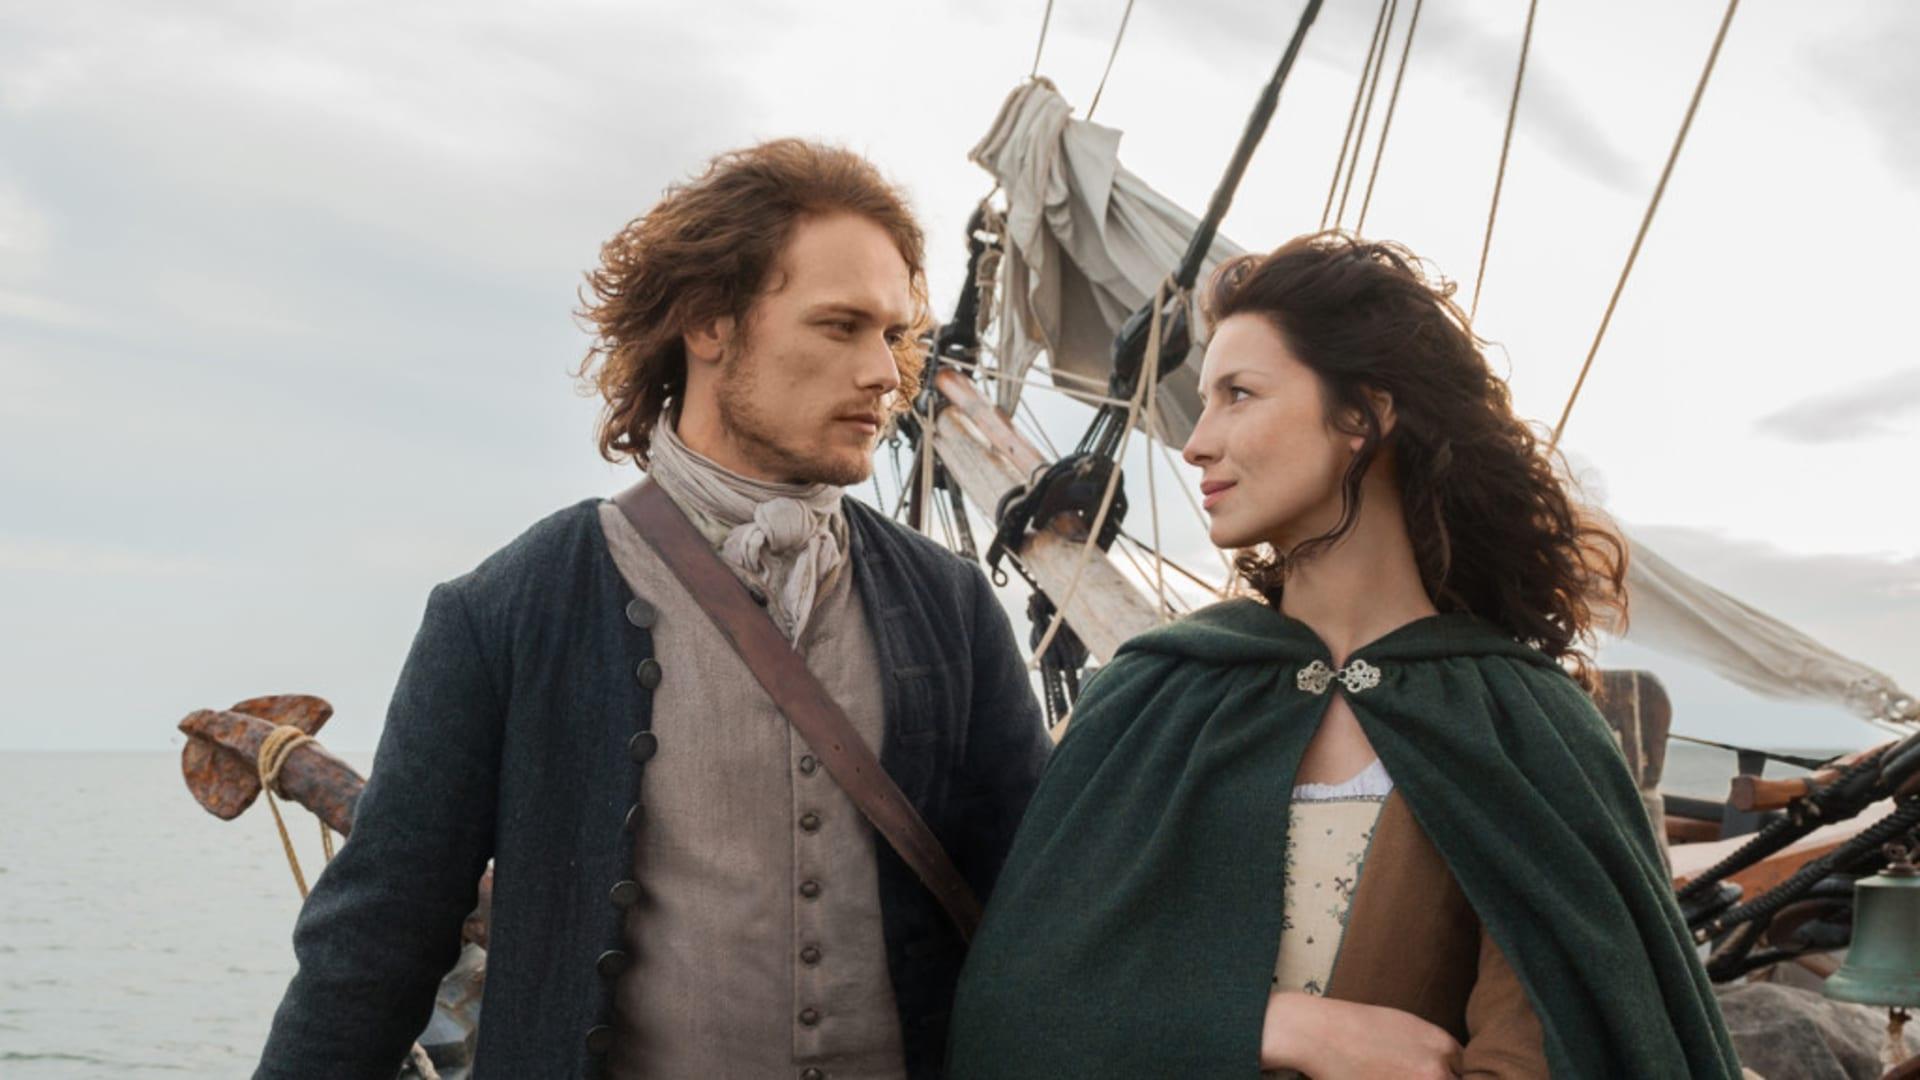 Outlander Season 1 throwback: A week off before a big episode